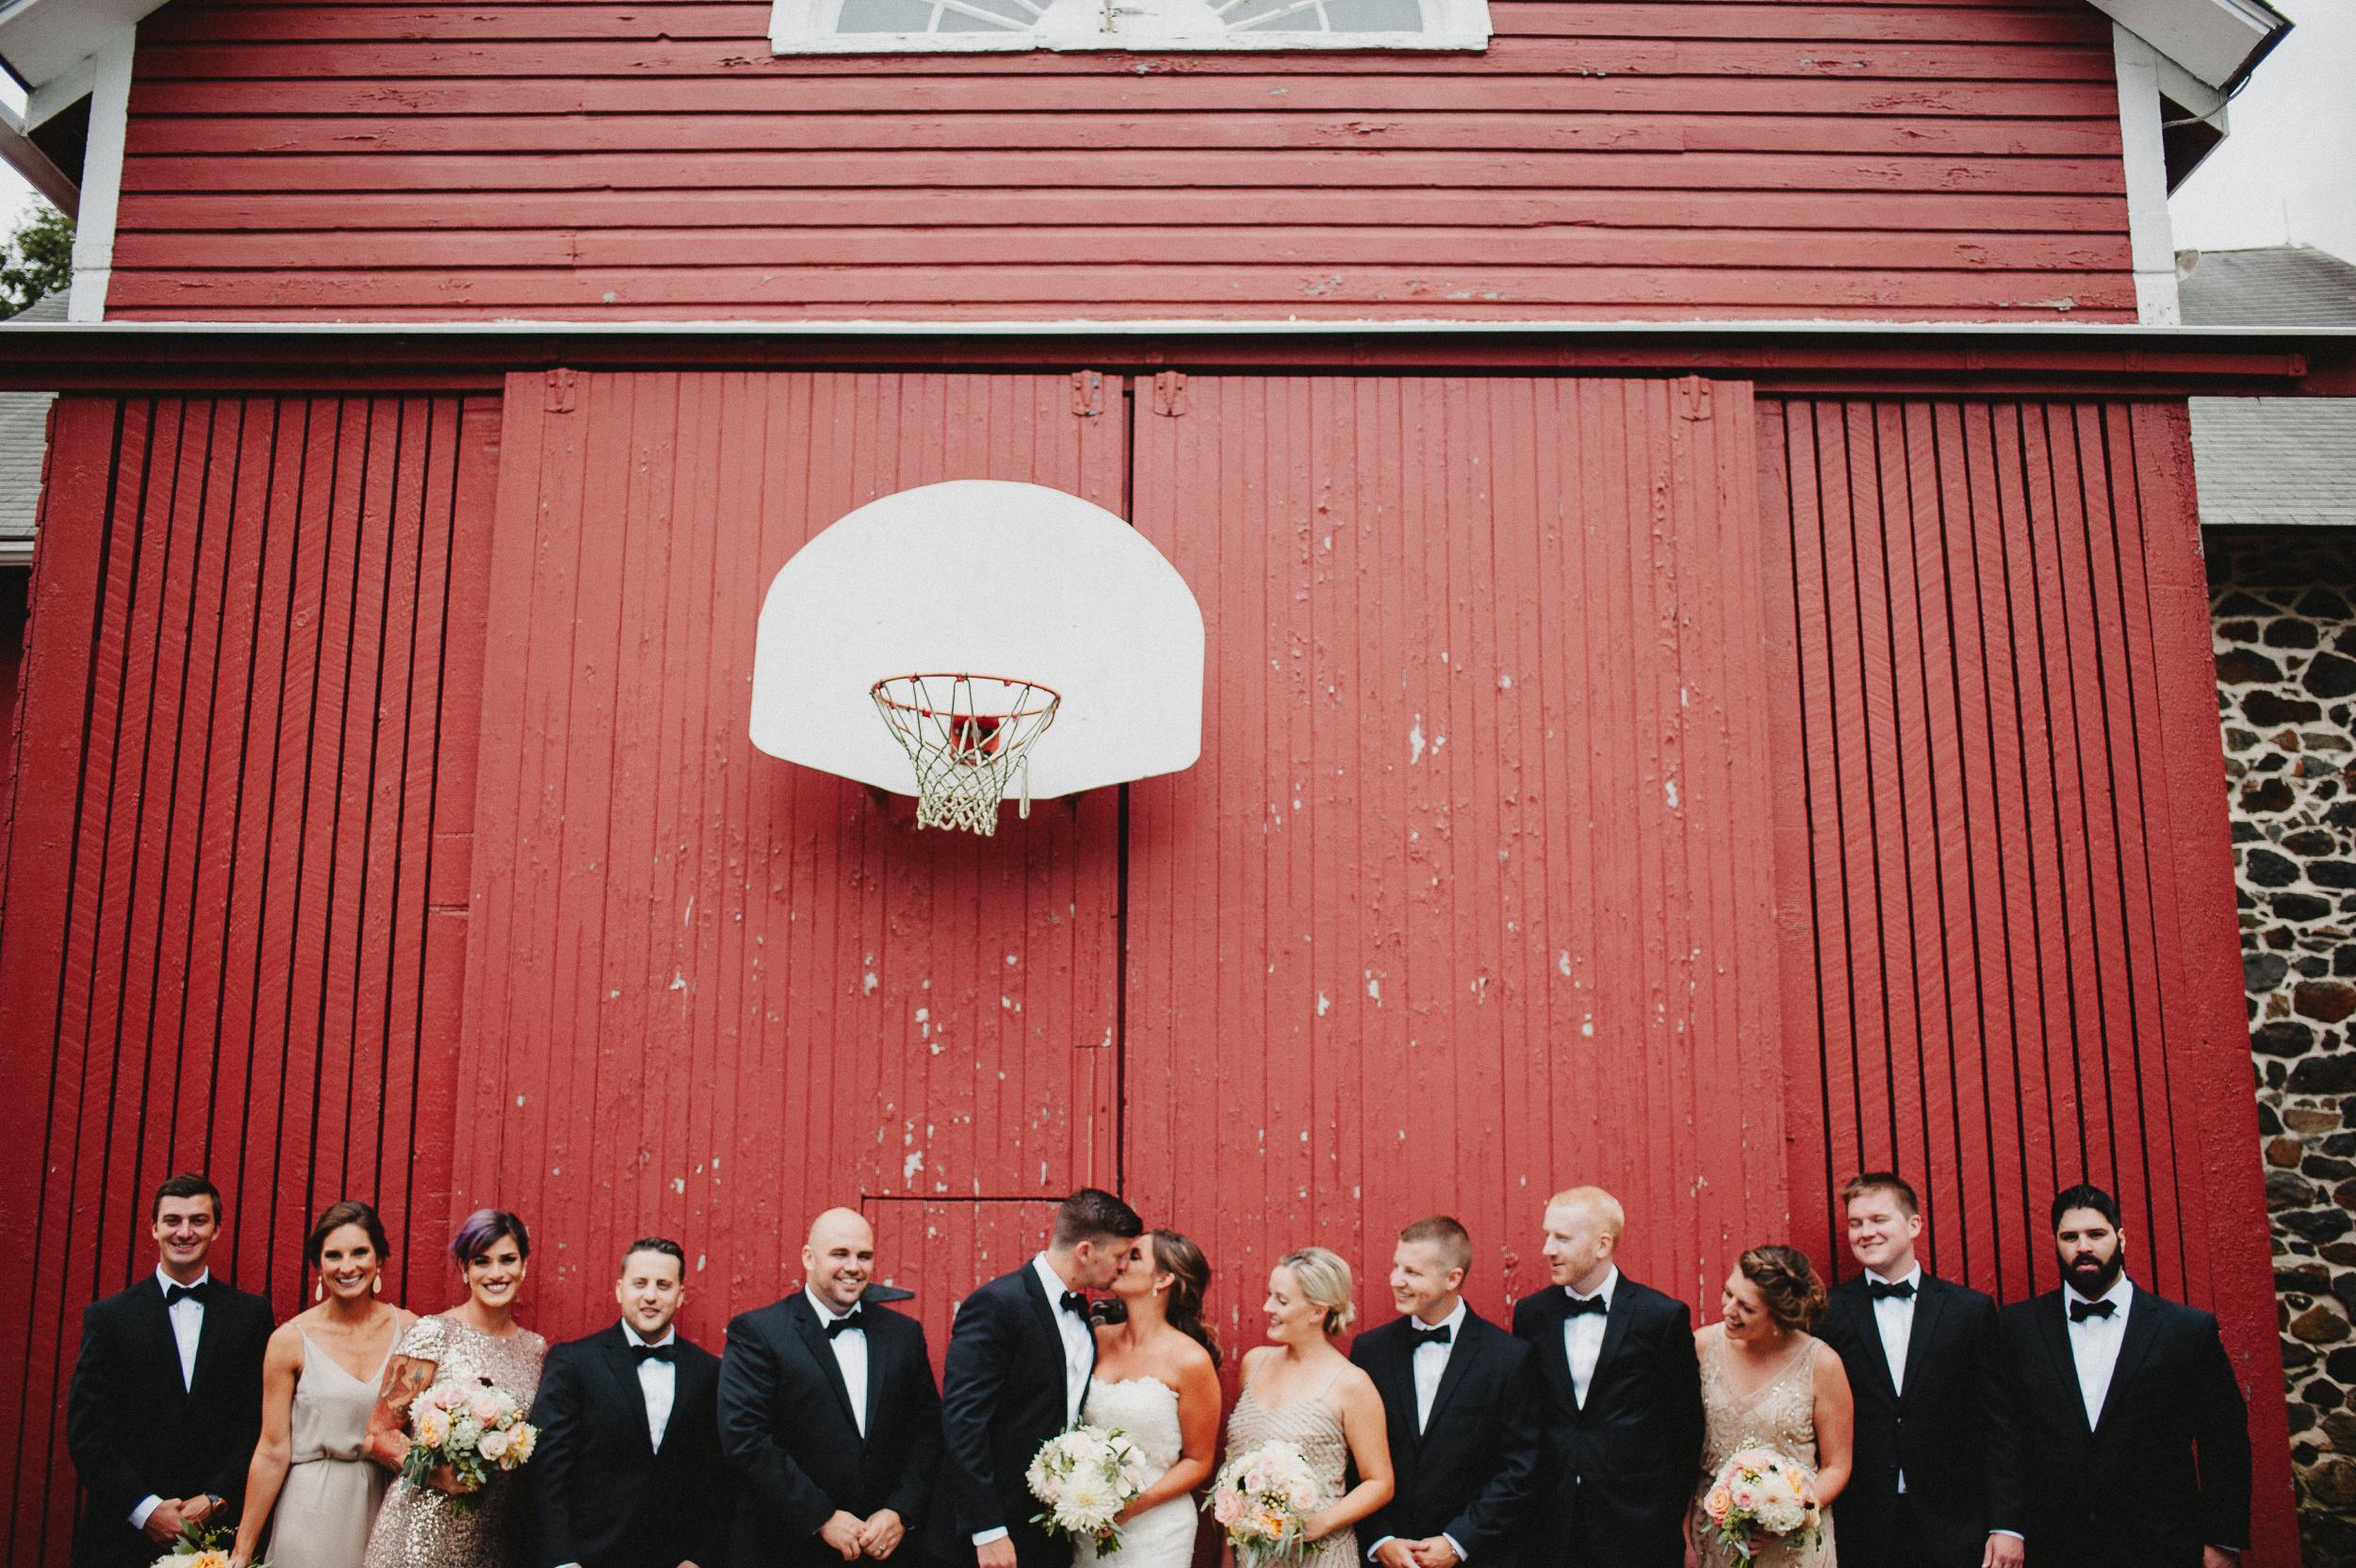 delaware-estate-wedding-photographer-pat-robinson-photography-45.jpg